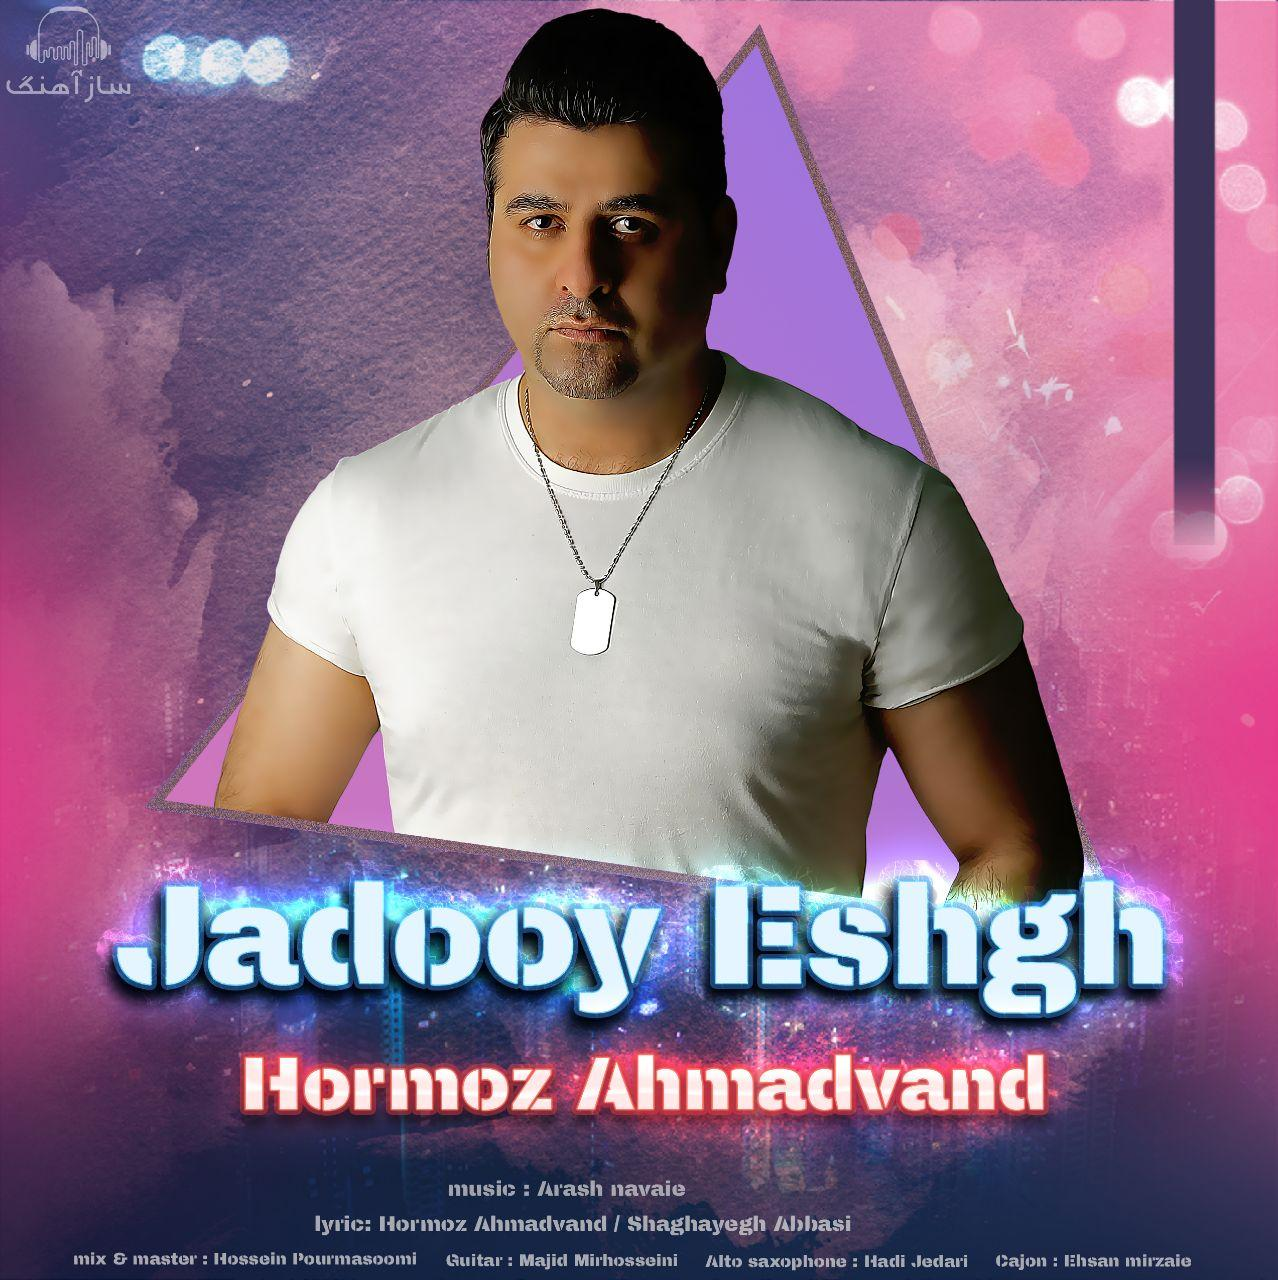 Hormoz Ahmadvand – Jadooy Eshgh